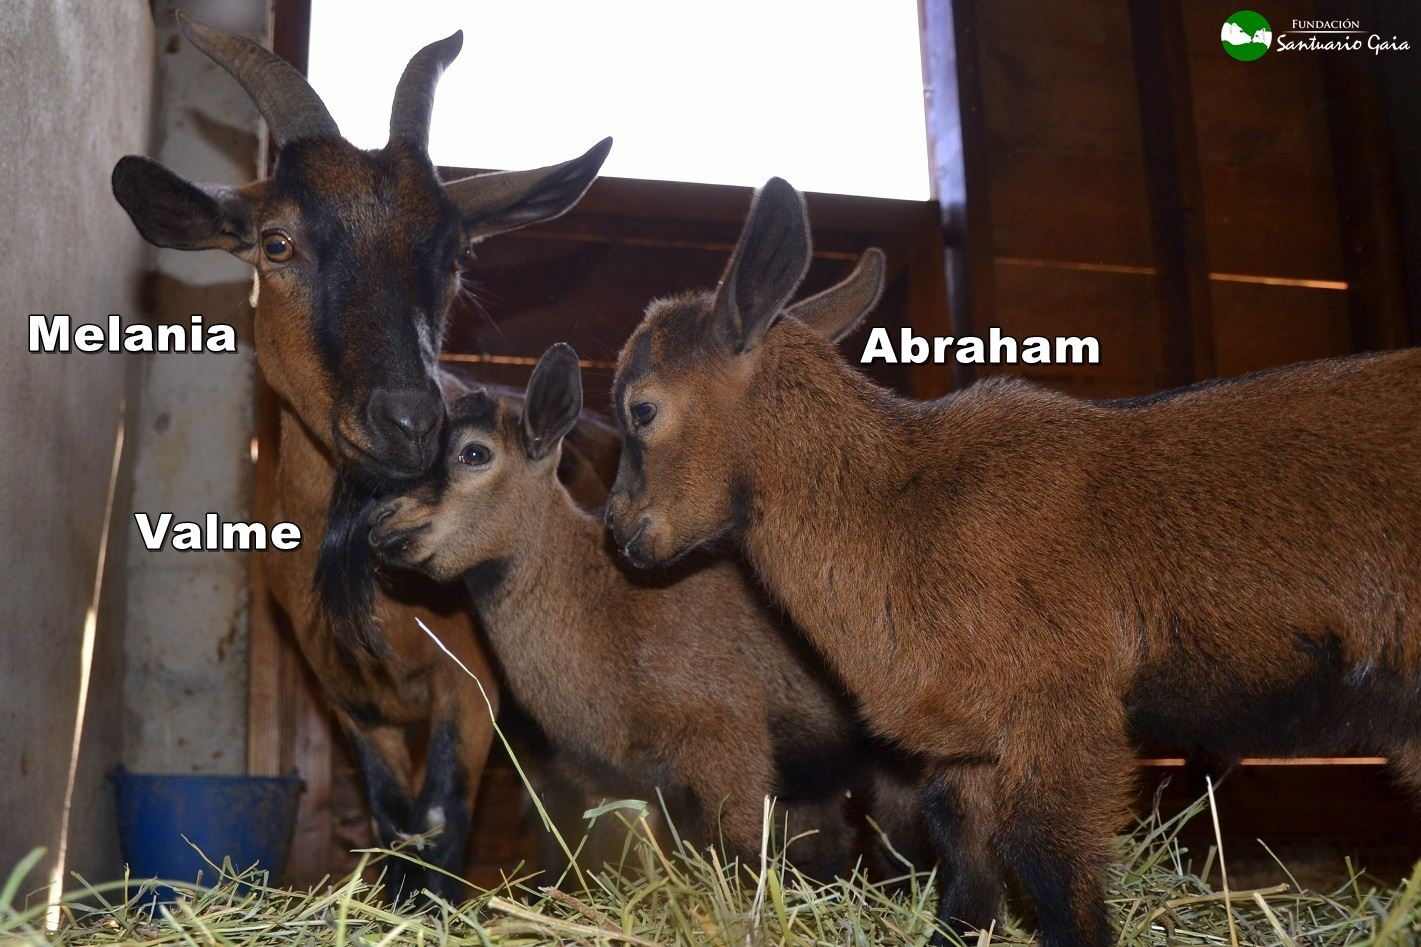 Melania Valme Abraham